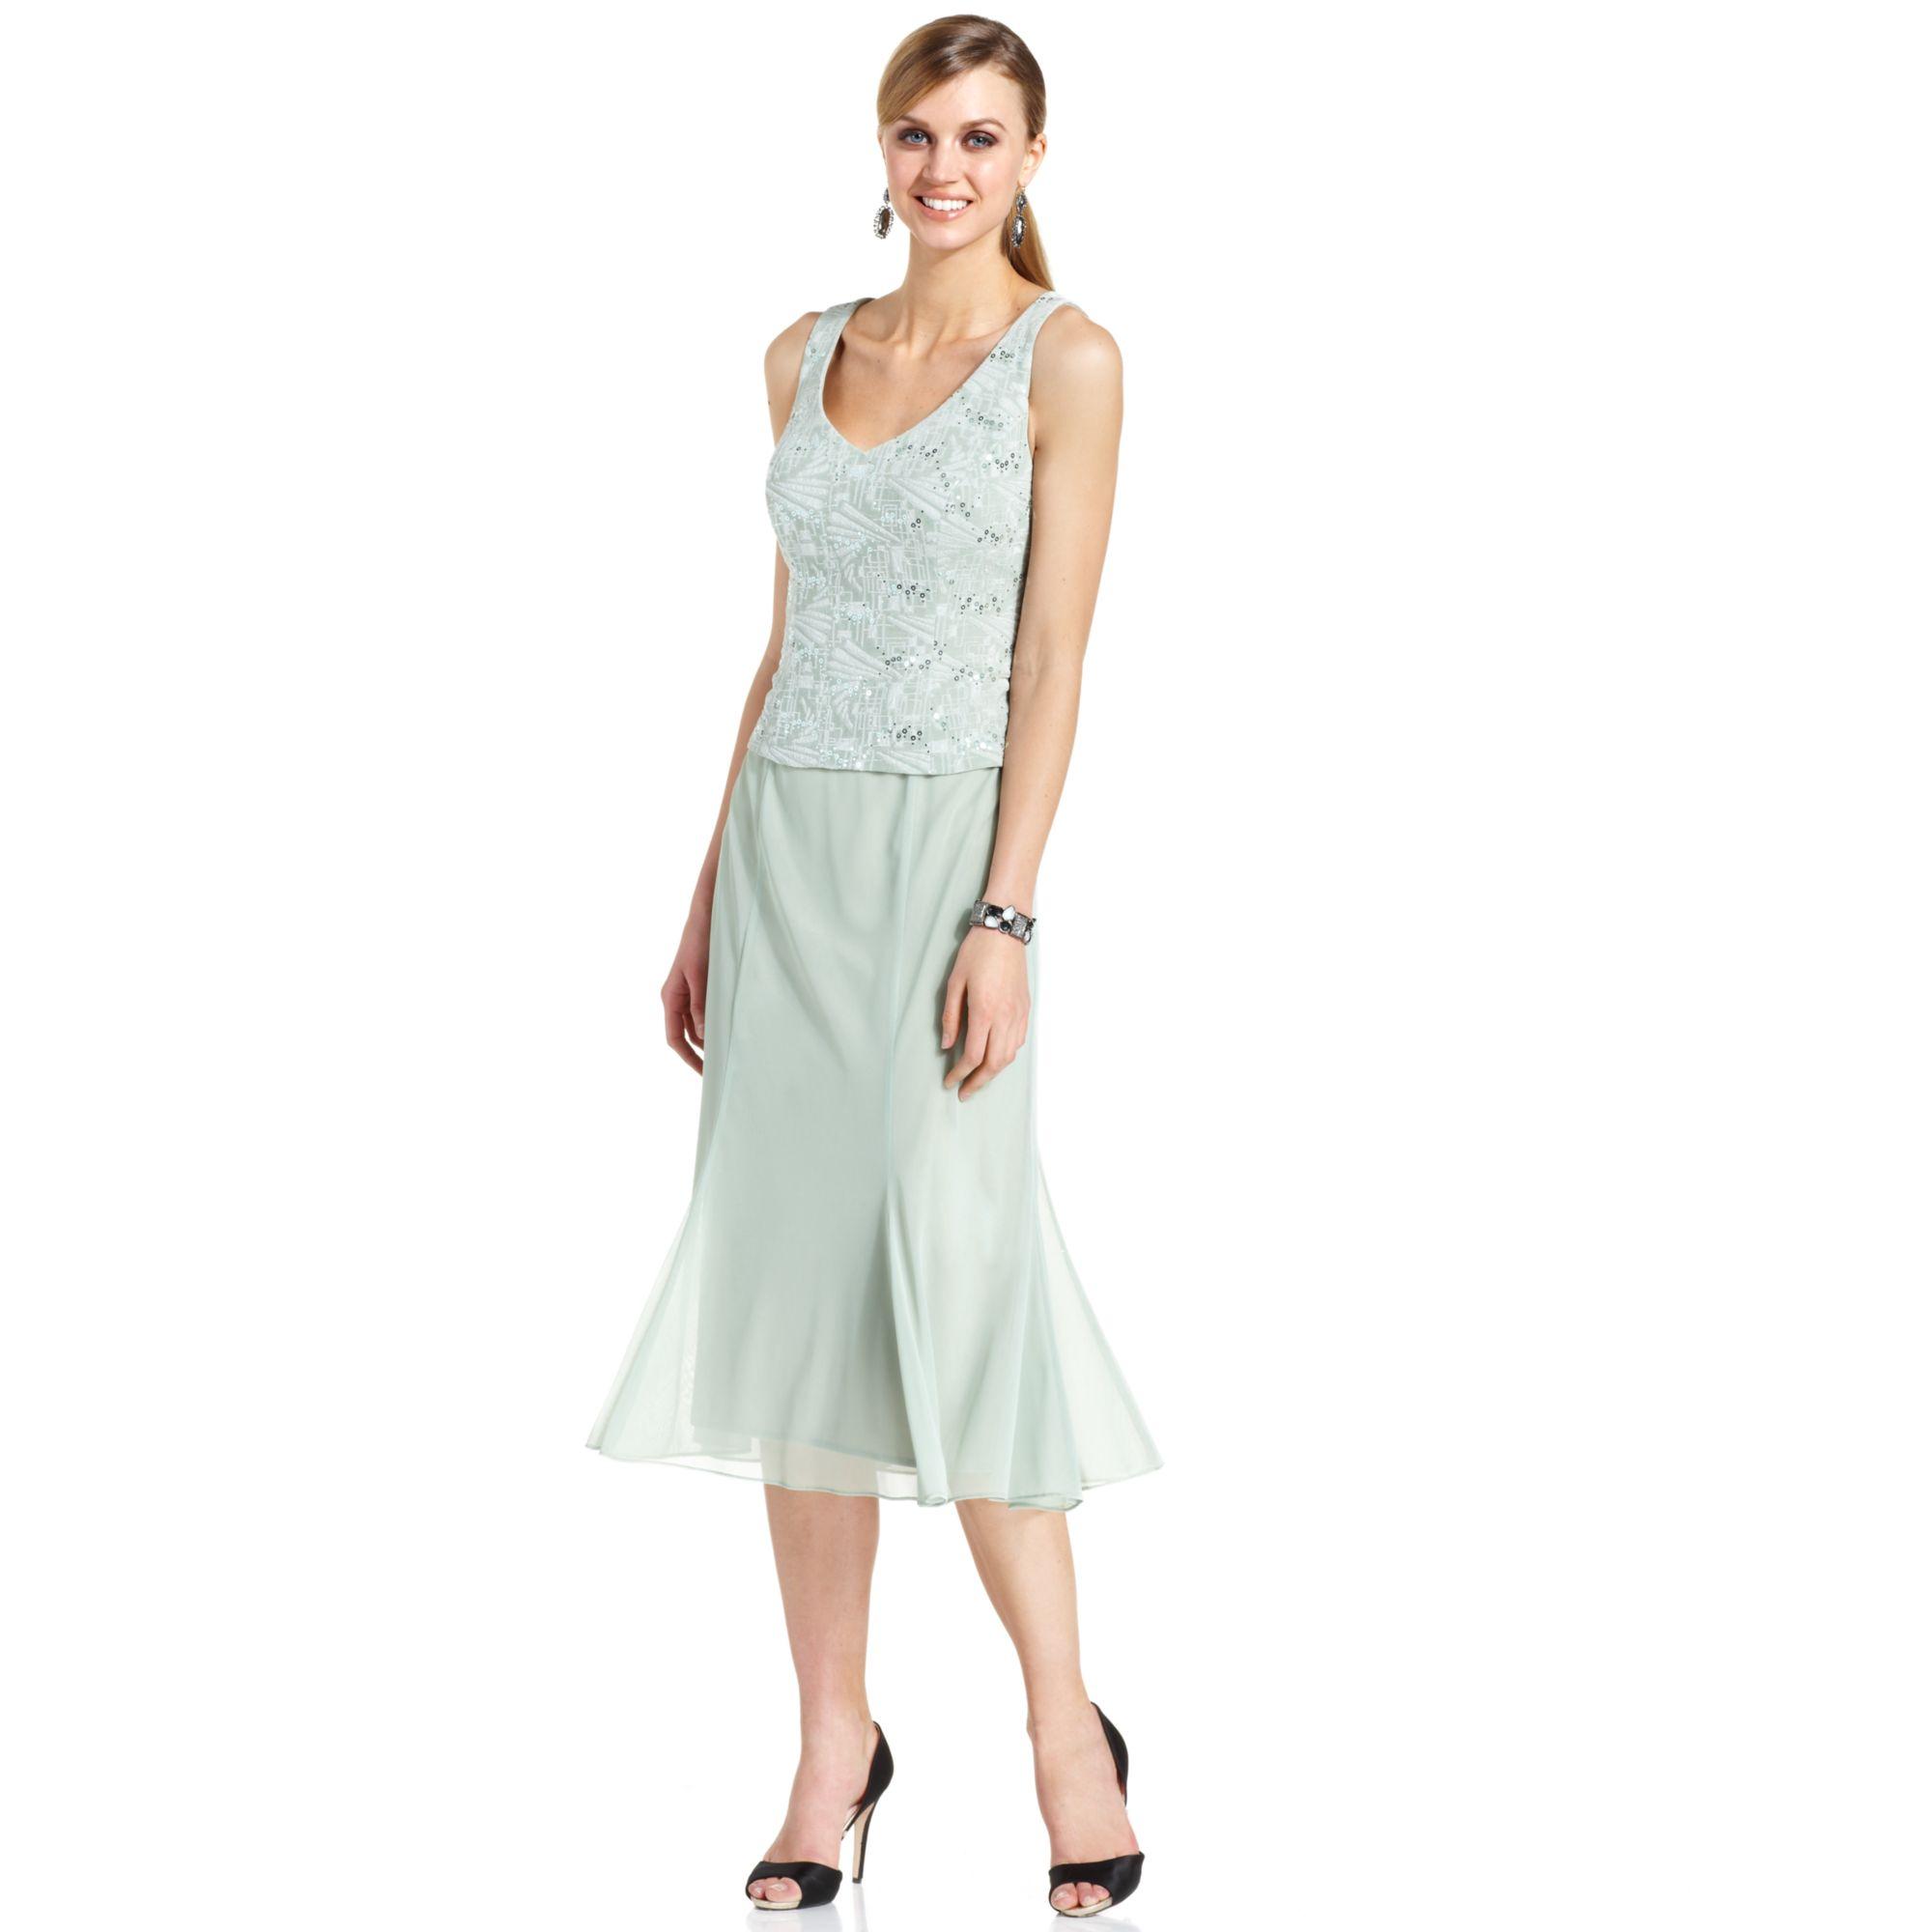 Lyst - Alex evenings Sleeveless Sequin Jacquard Dress And